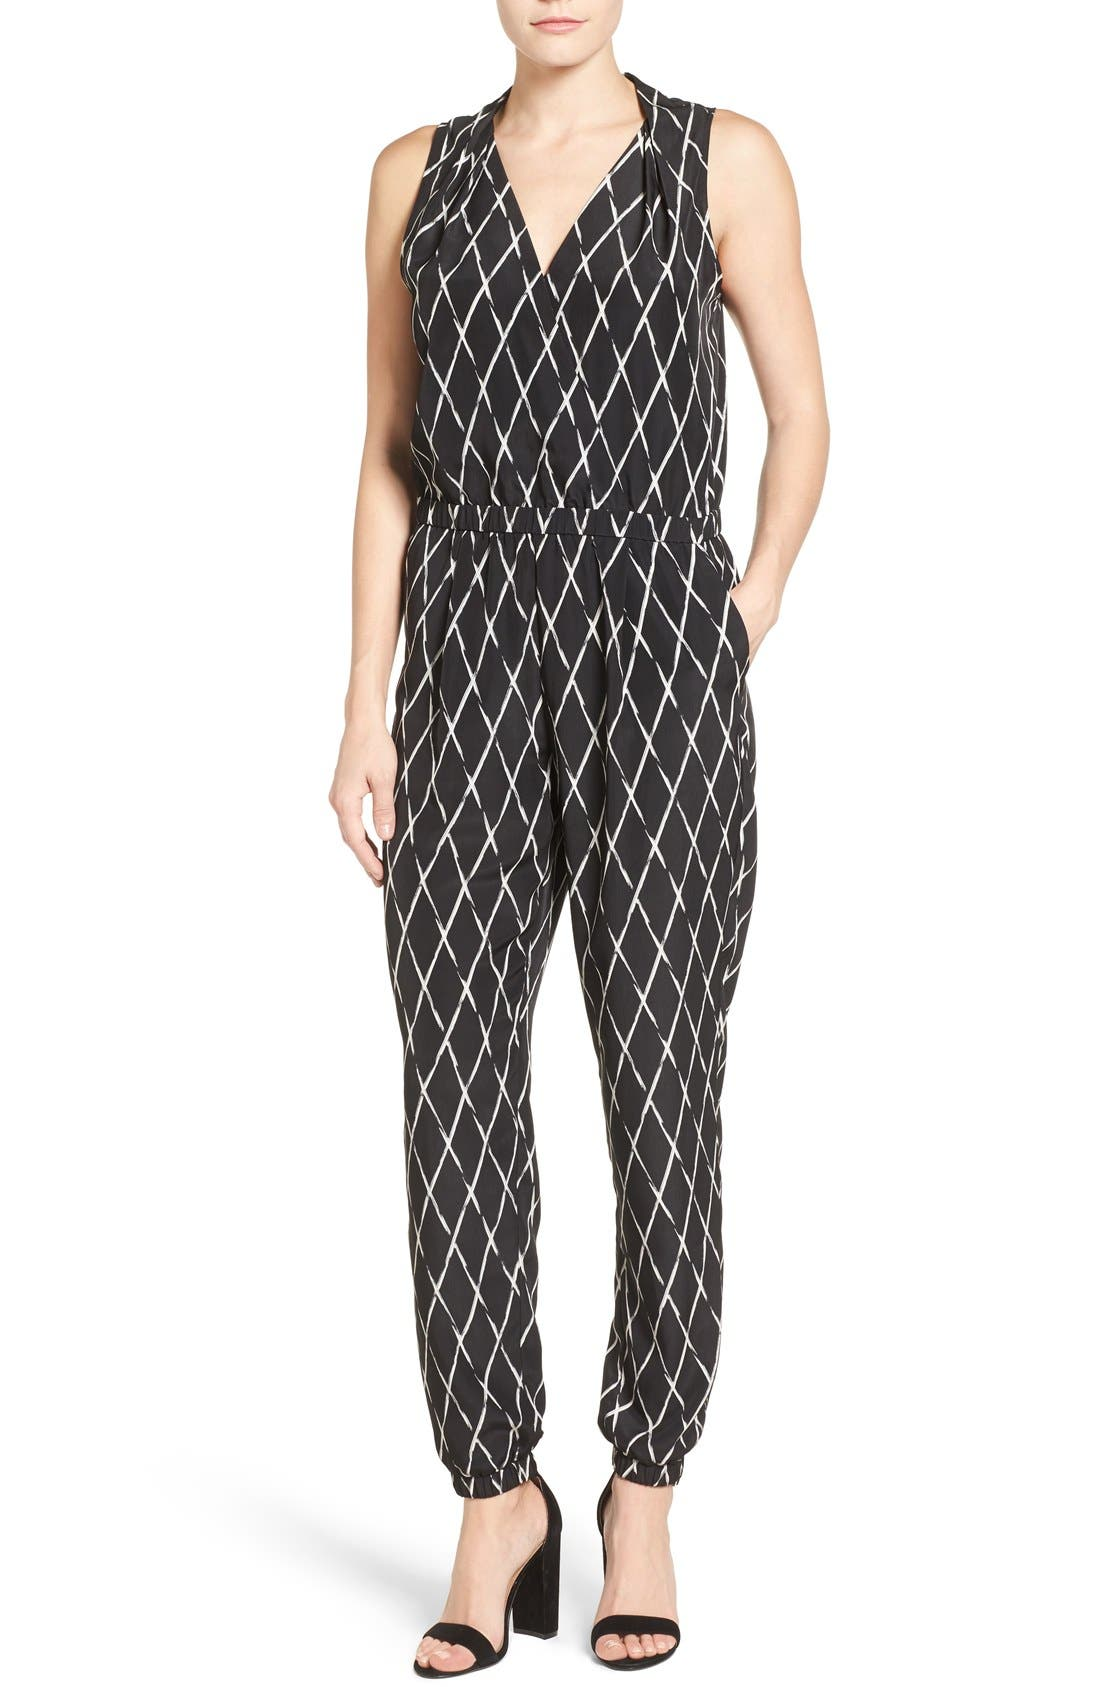 V-Neck Sleeveless Jumpsuit,                         Main,                         color, Black-Ivory Crossing Print